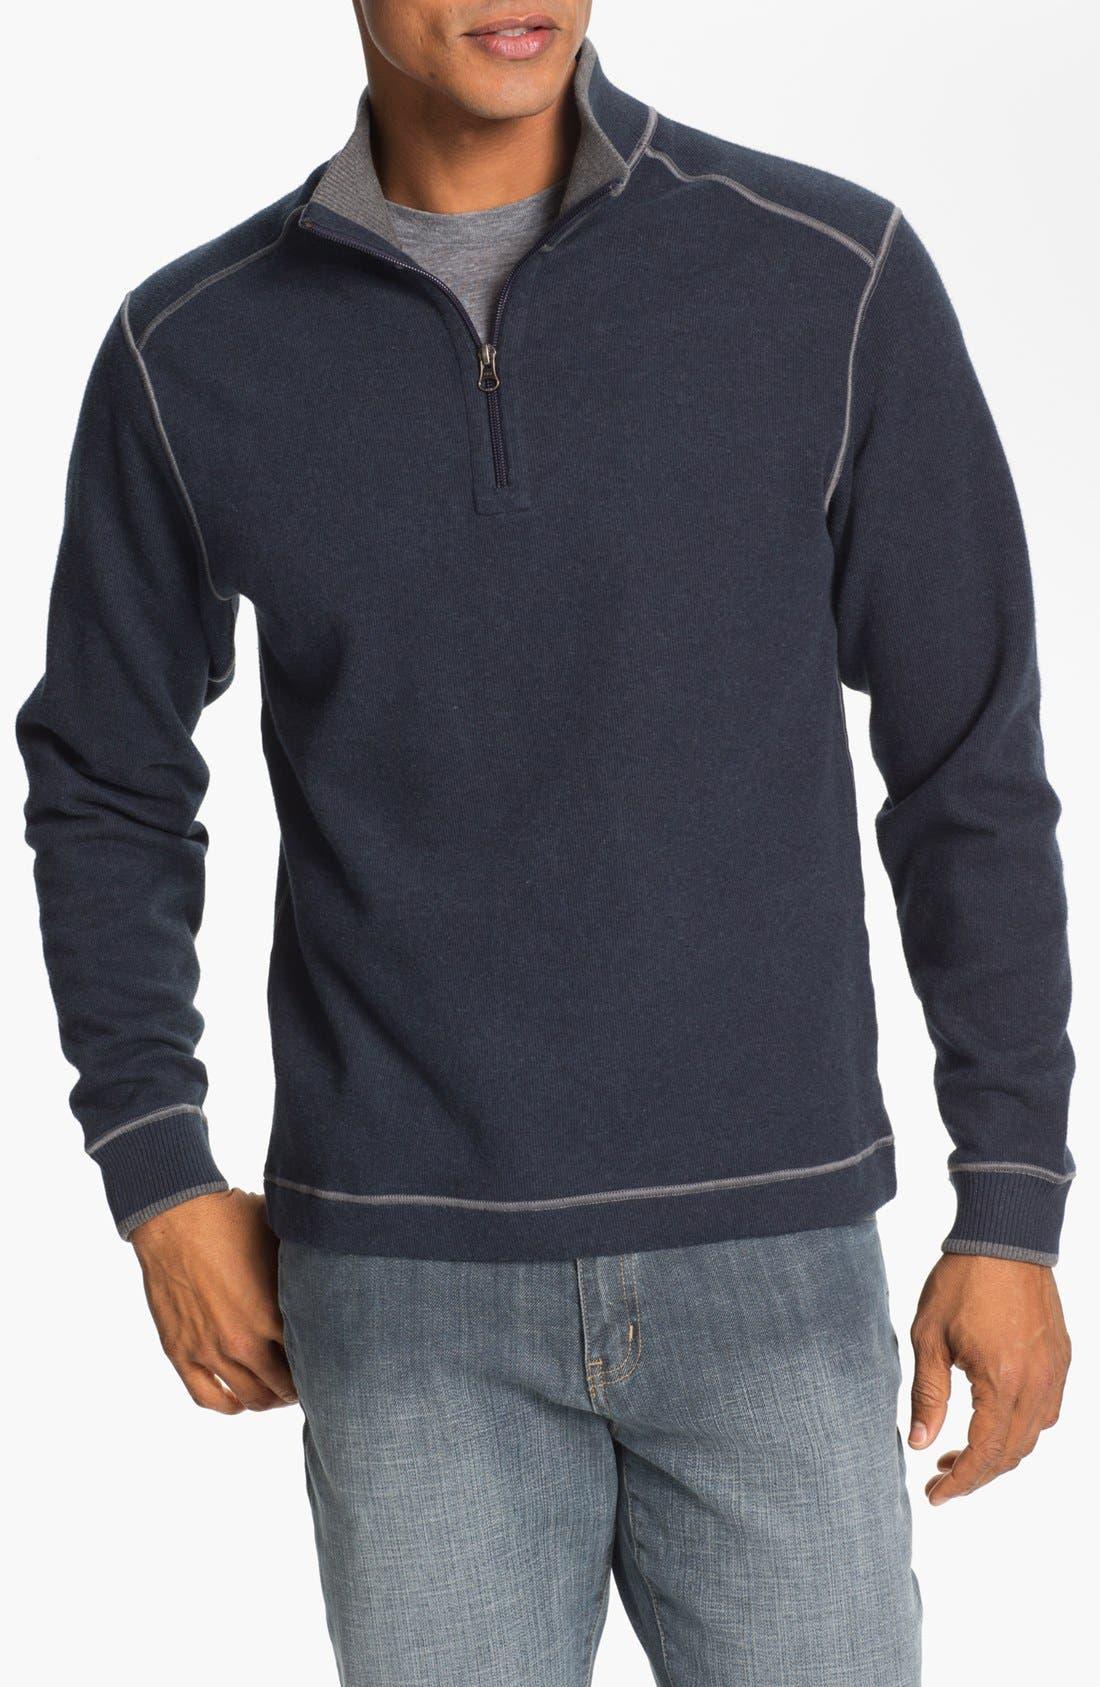 Alternate Image 1 Selected - Cutter & Buck 'Overtime' Regular Fit Half Zip Sweater (Big & Tall)